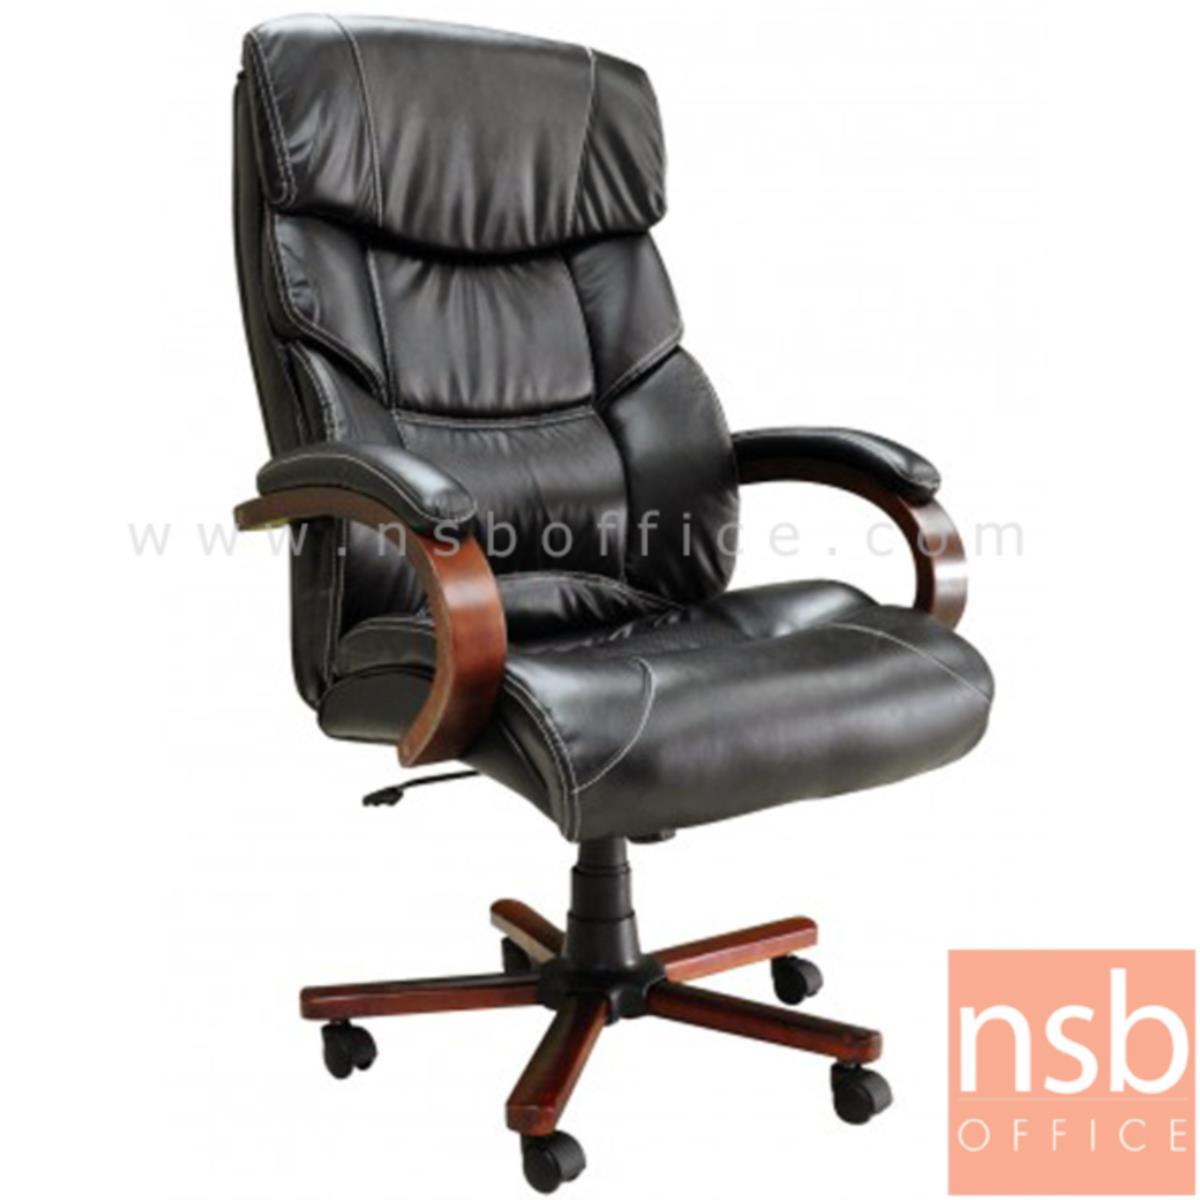 B25A091:เก้าอี้ผู้บริหารหนัง PU รุ่น FTS-SLCO-0512  โช๊คแก๊ส มีก้อนโยก ขาไม้